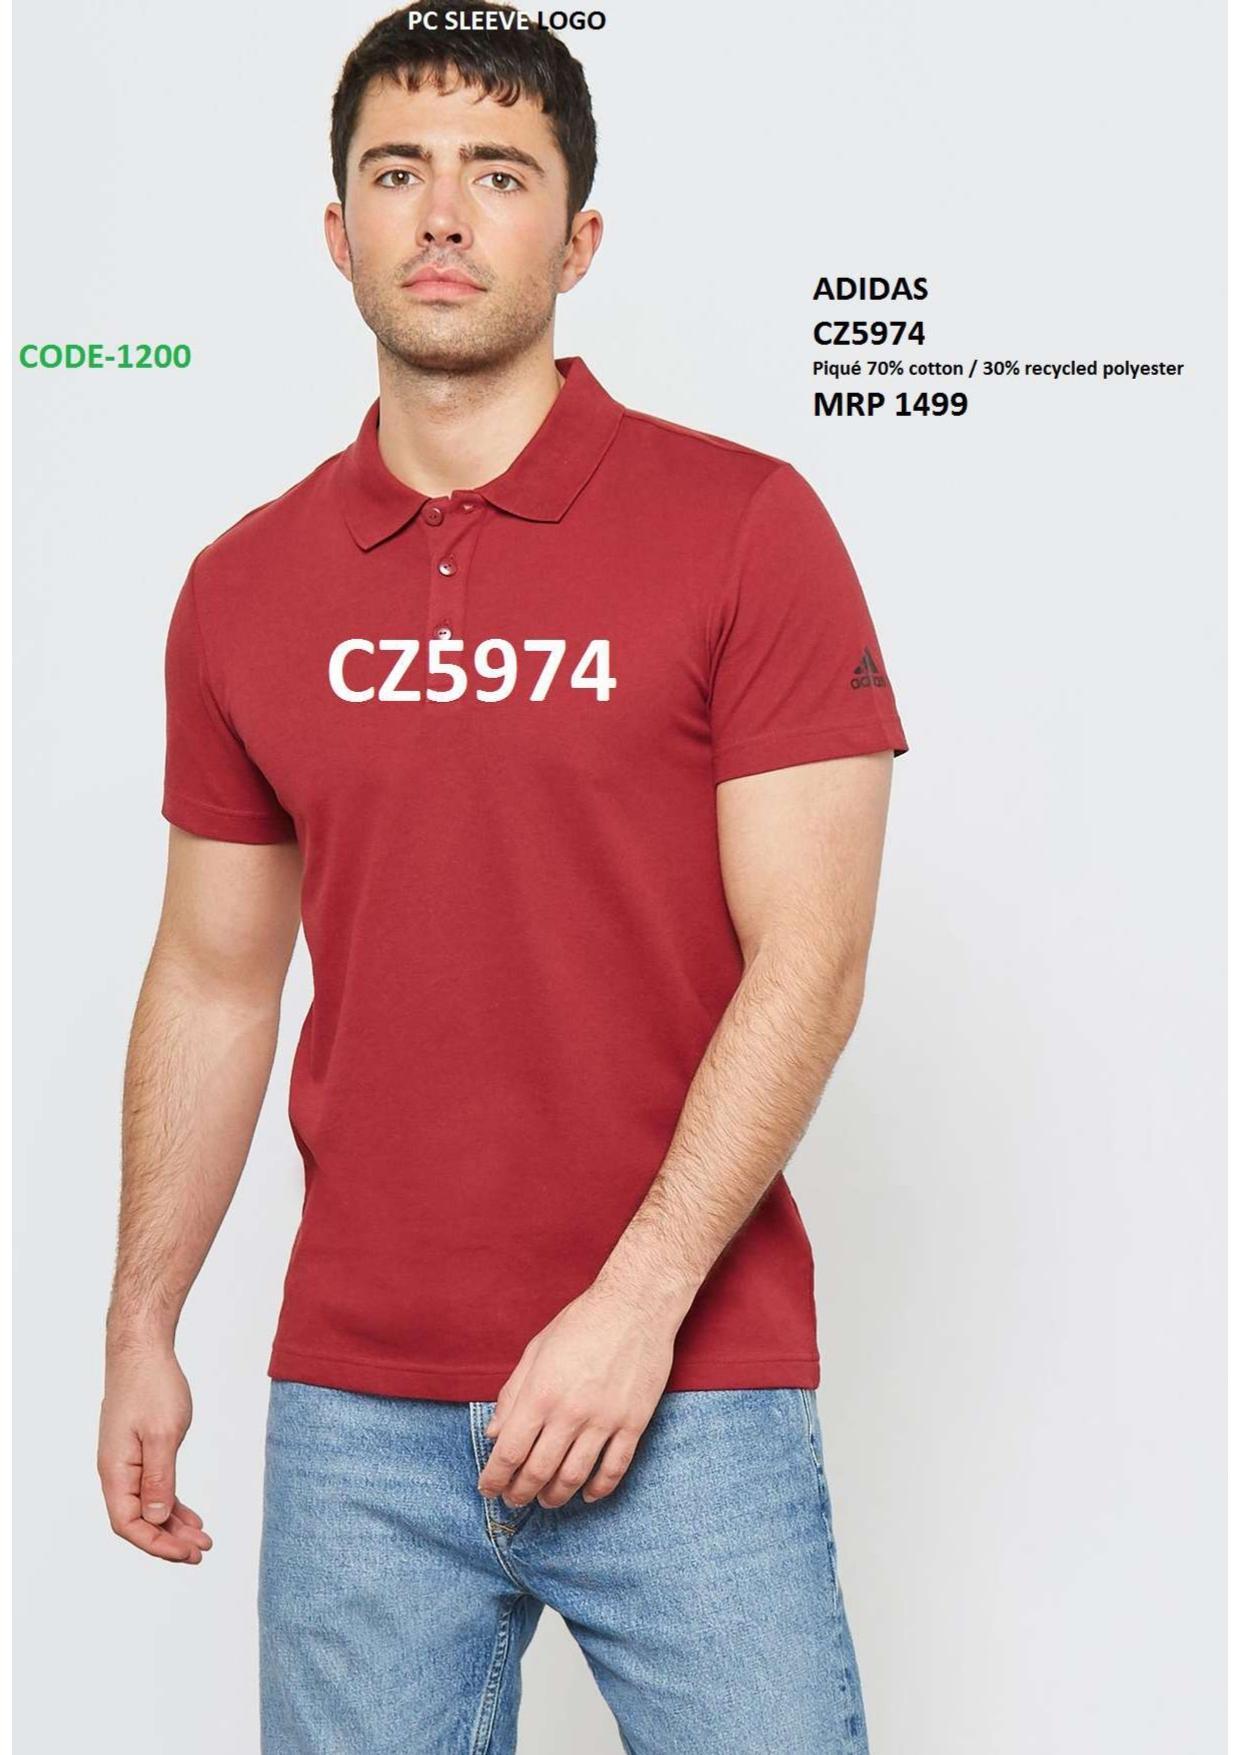 Adidas Sleeve Logo T Shirt